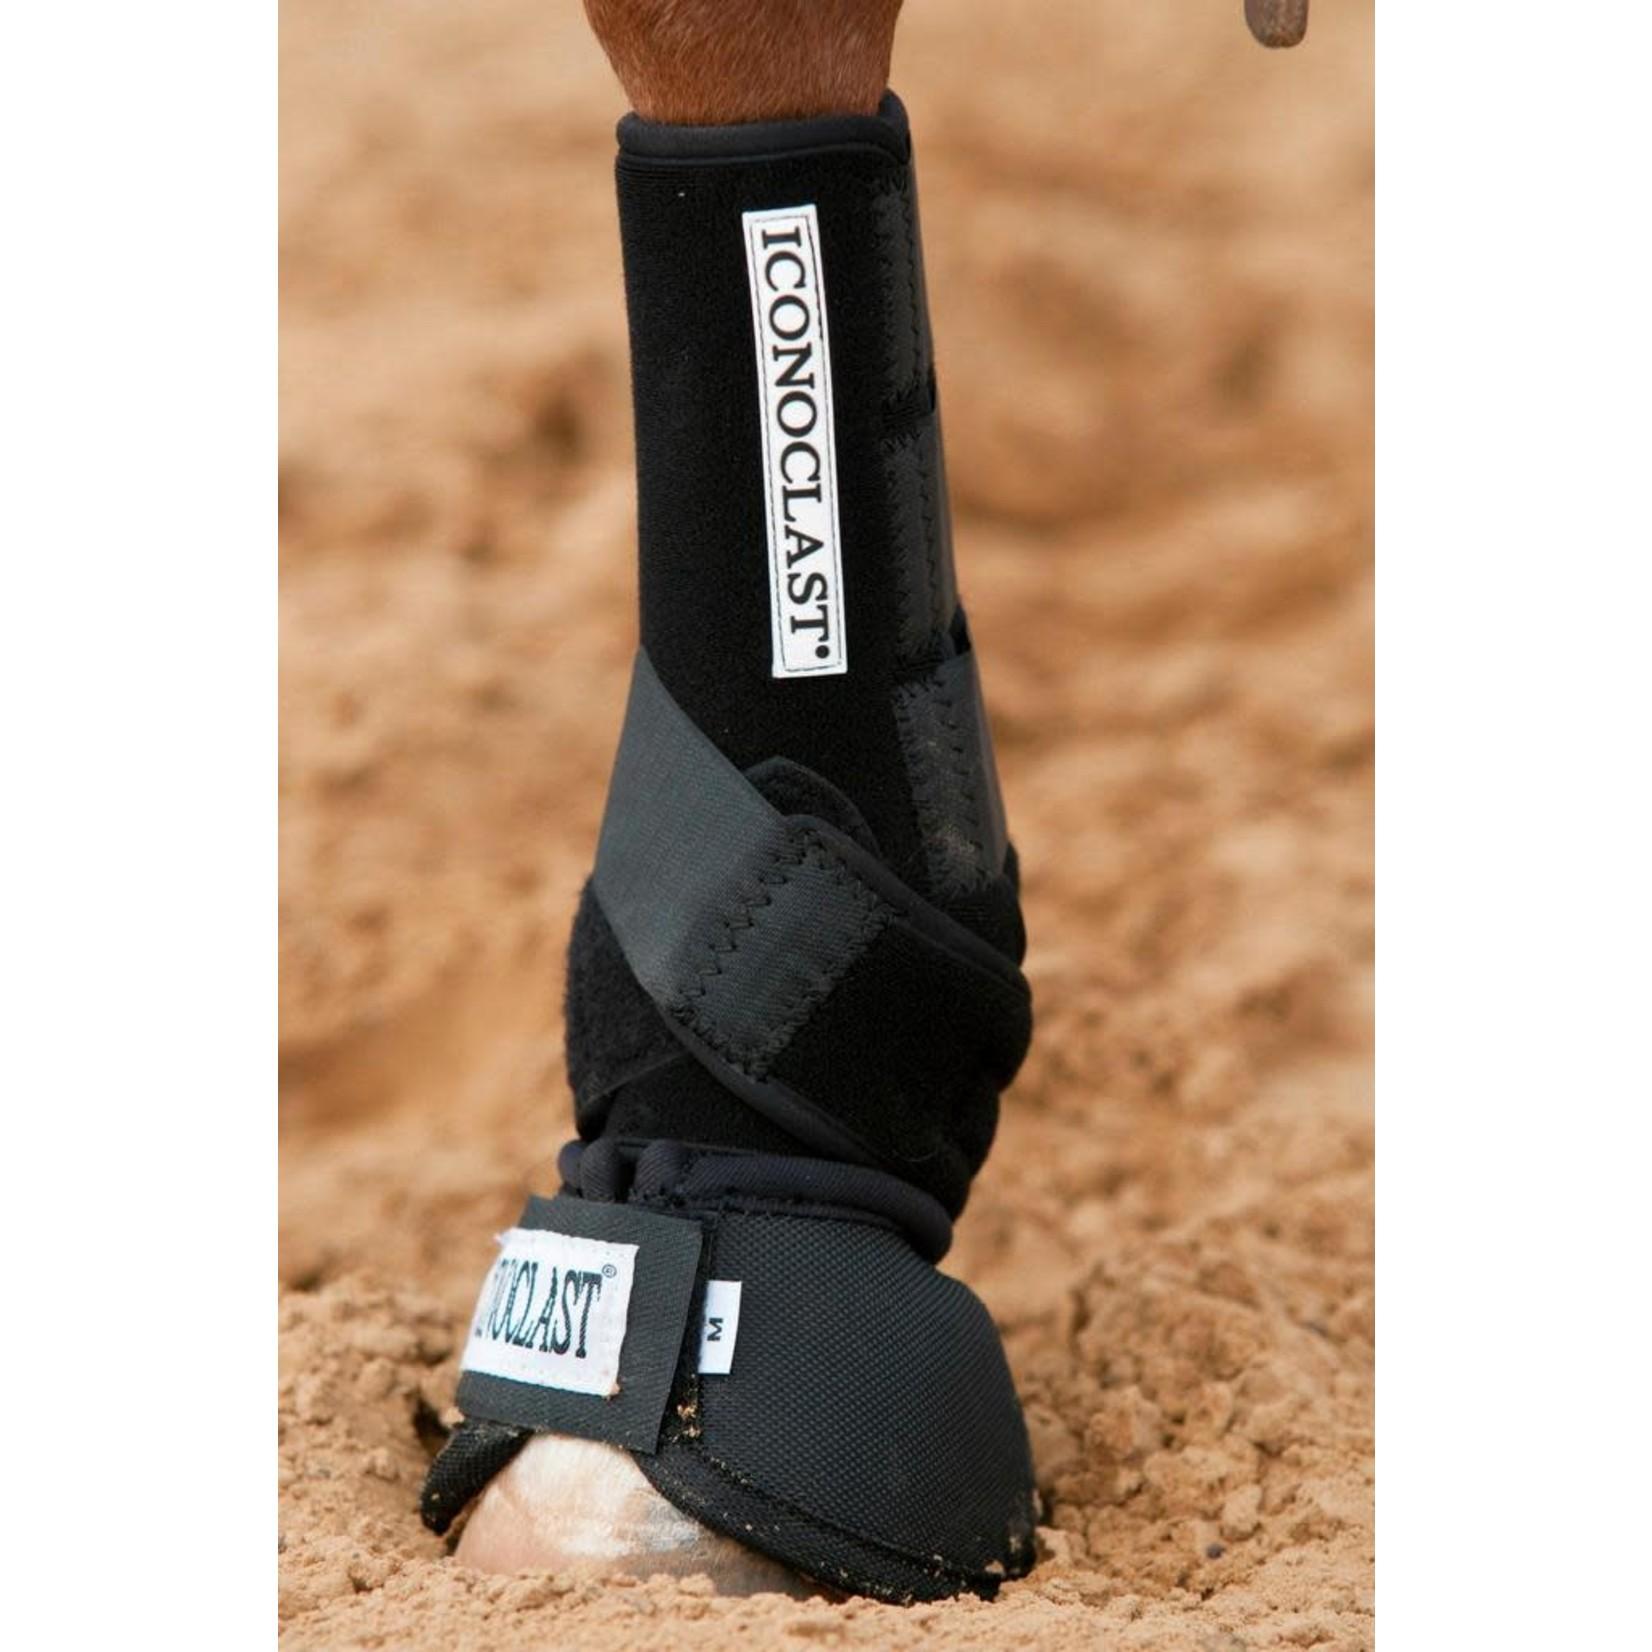 Iconoclast Hind Boots - B/Lrg